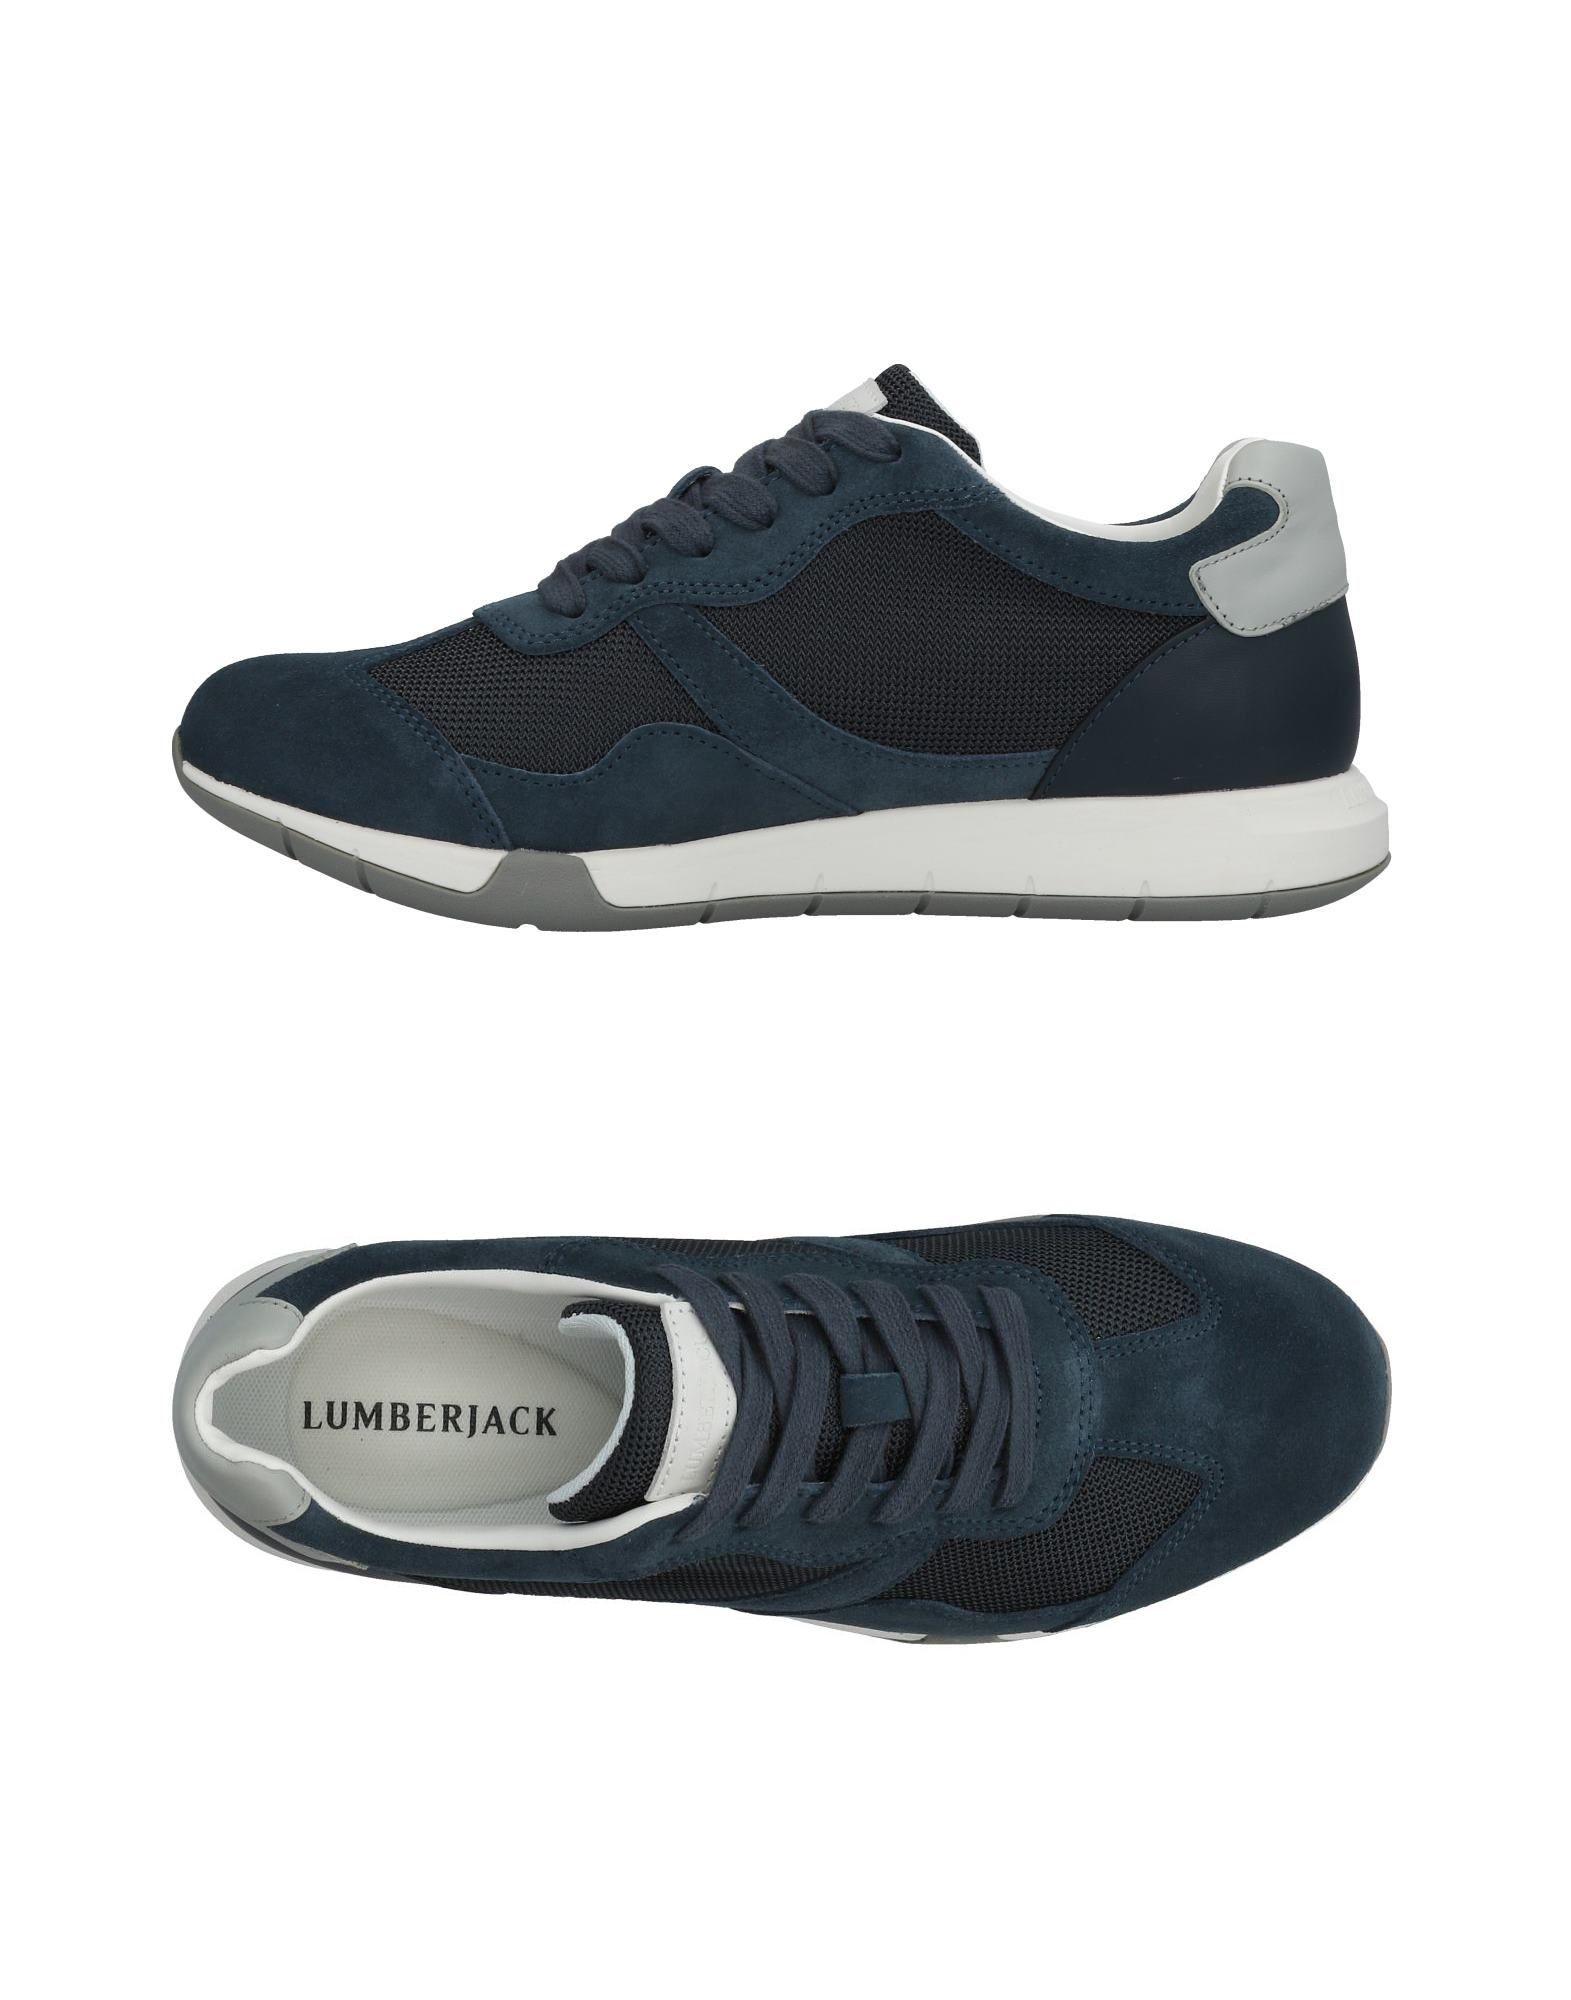 Lumberjack Sneakers Herren  11441730KW Heiße Schuhe Schuhe Schuhe 8f81ac